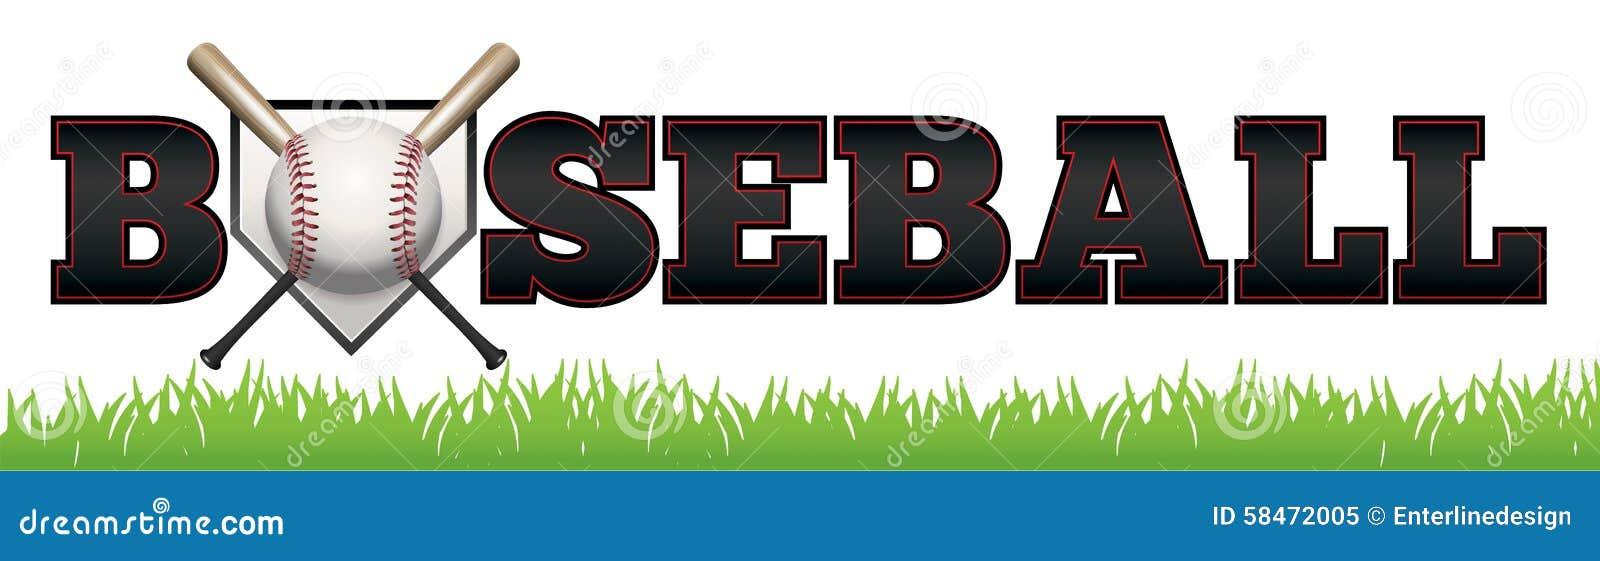 Baseball-Wort Art Illustration